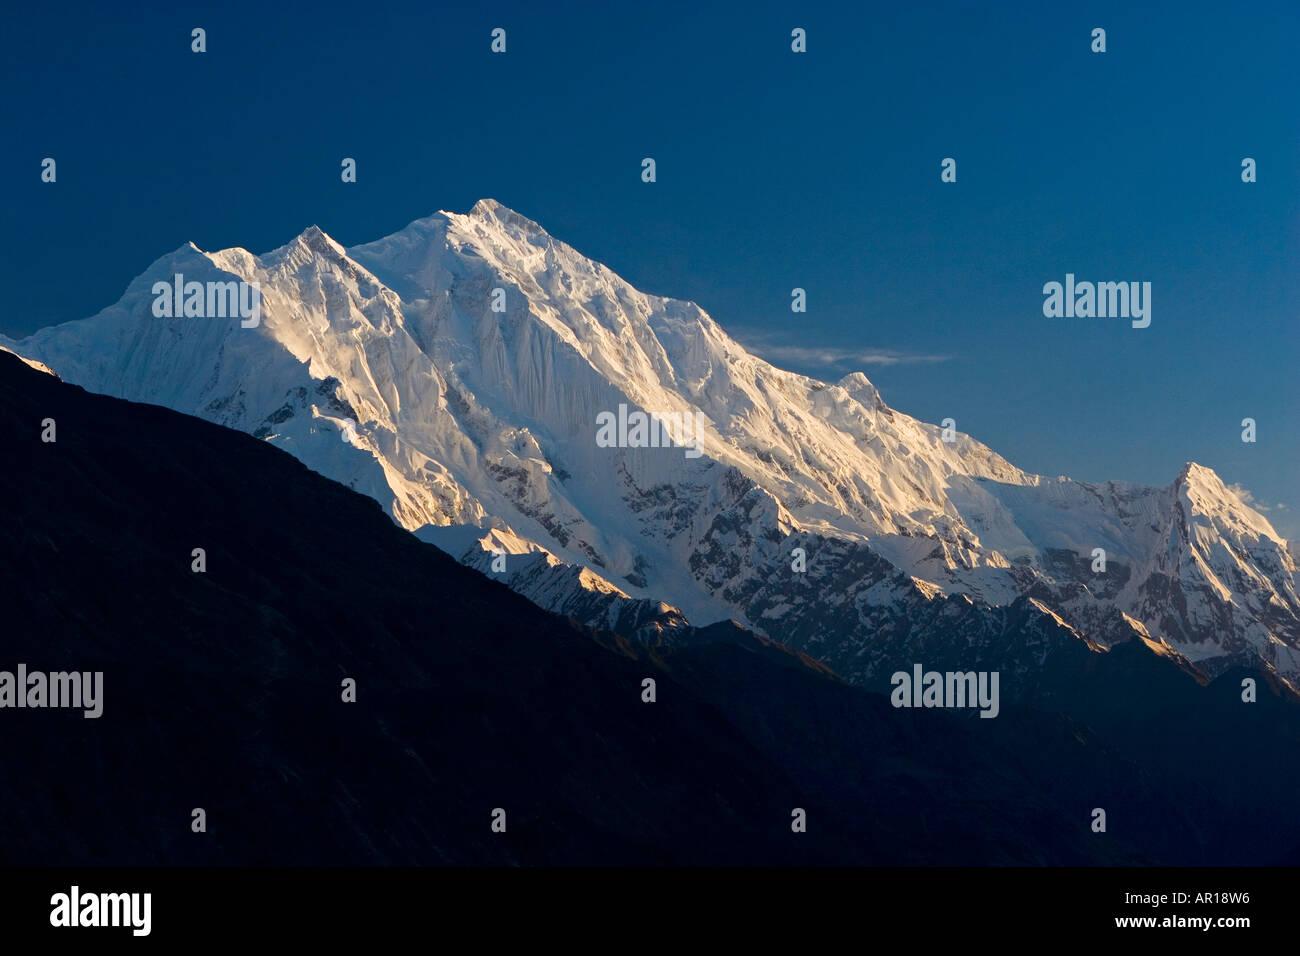 The splendid peak of Mt Rakaposhi at sunset viewed from Karimabad Pakistan - Stock Image